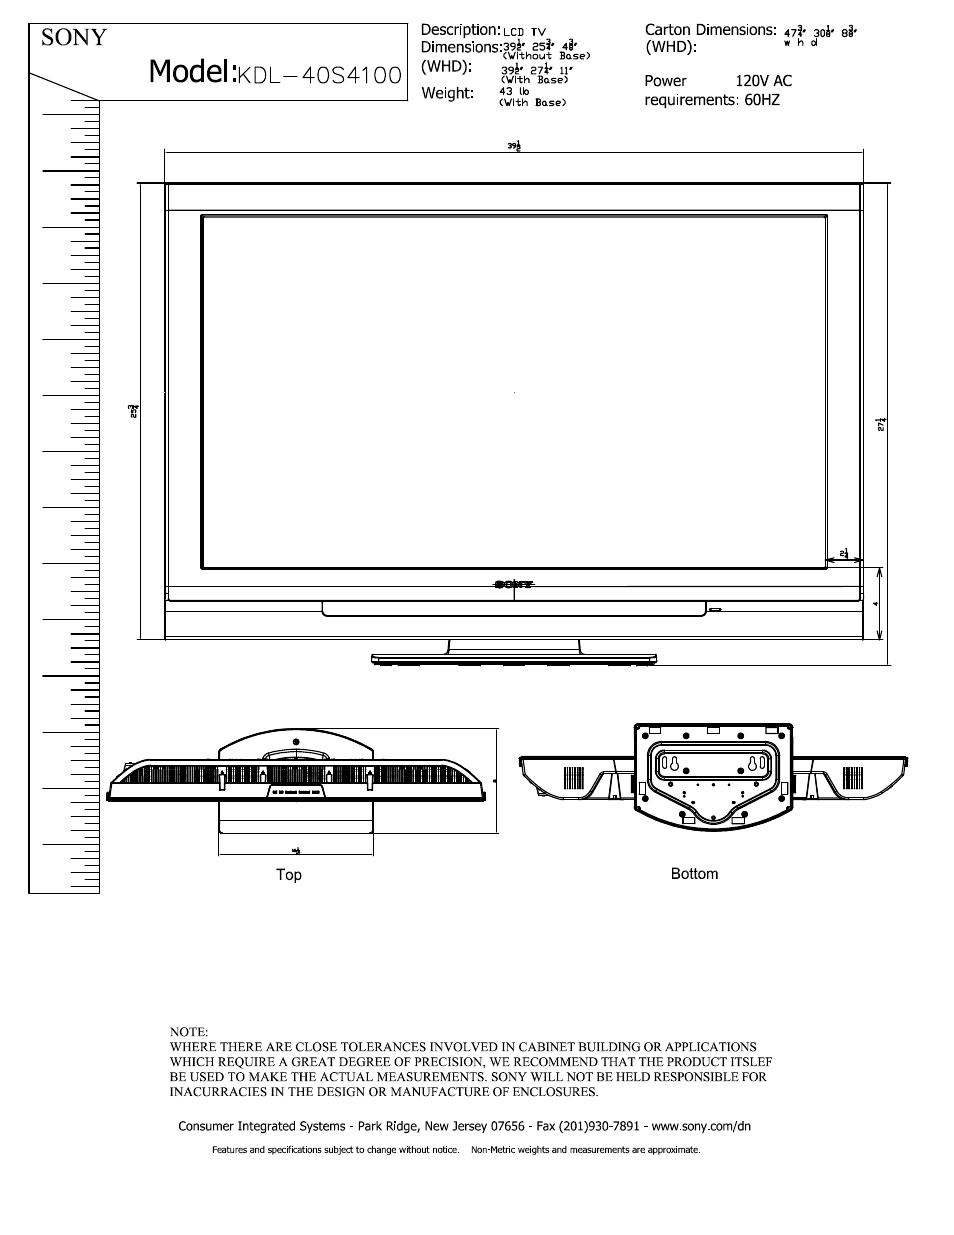 sony kdl 40s4100 user manual 2 pages rh manualsdir com sony bravia 40s4100 manual sony kdl-40s4100 service manual